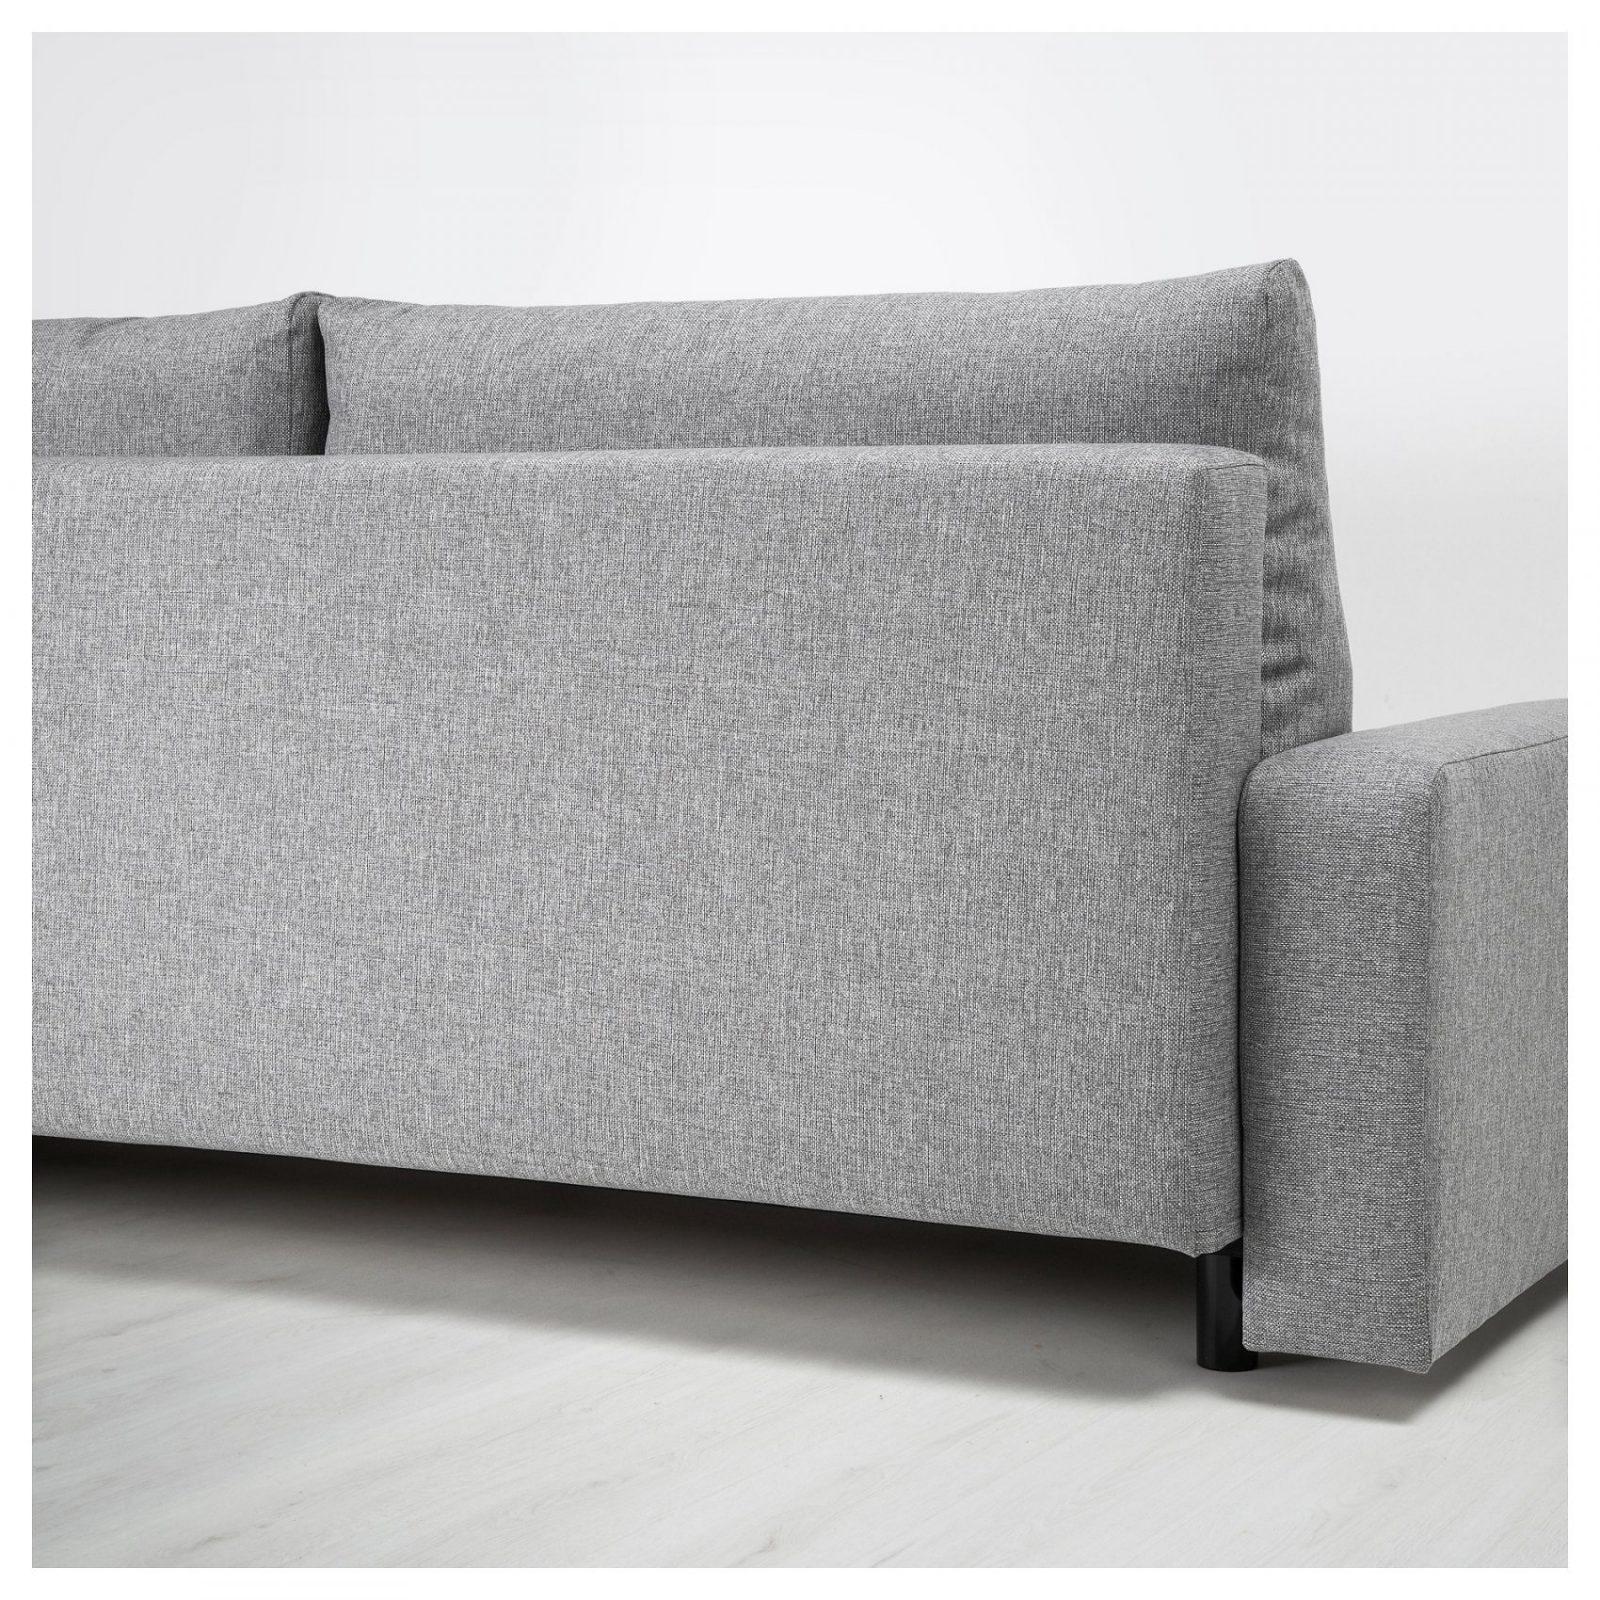 Avis Canapé Convertible Ikea | Plan De Maison intérieur Gralviken Ikea